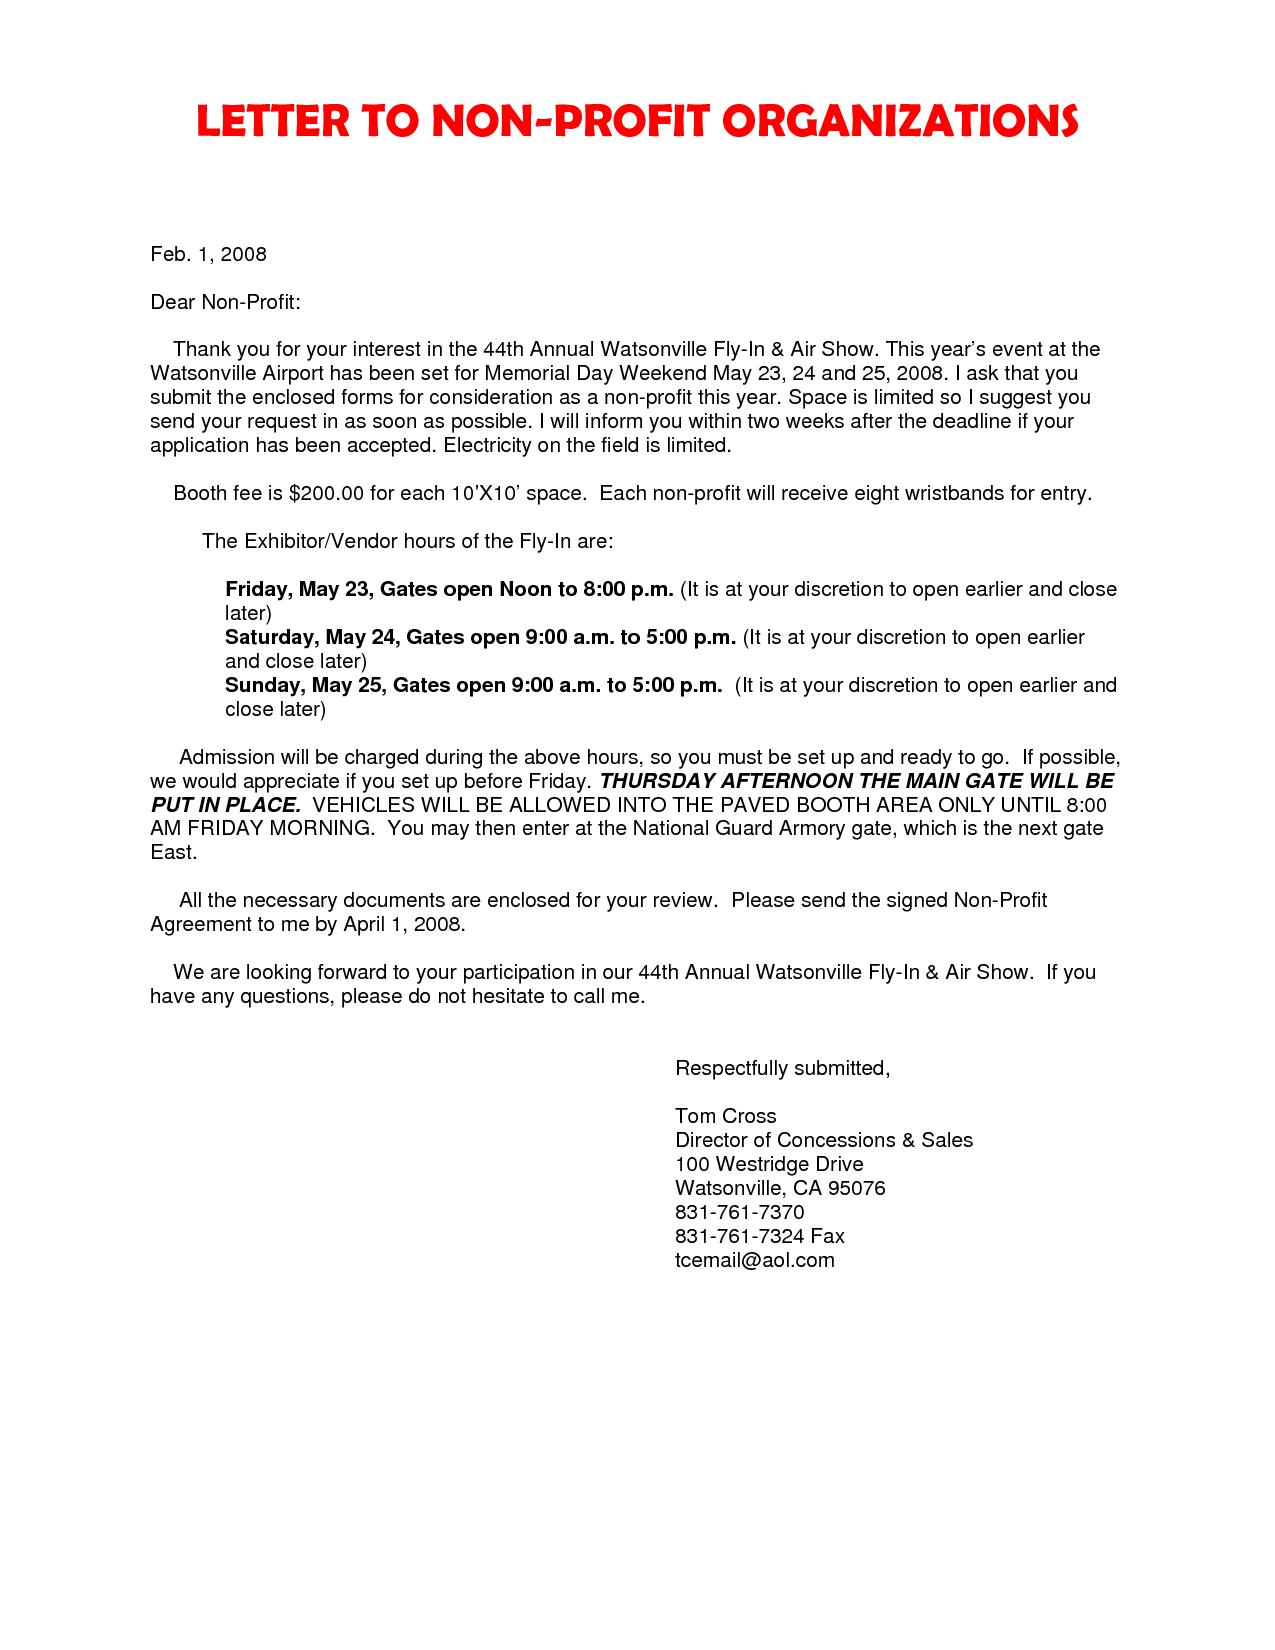 Resume Donation Letter Samples For Non Profit Format Template Job Desc And Letter Sample Wallkopets Xyz Donation Letter Cover Letter Tips Lettering